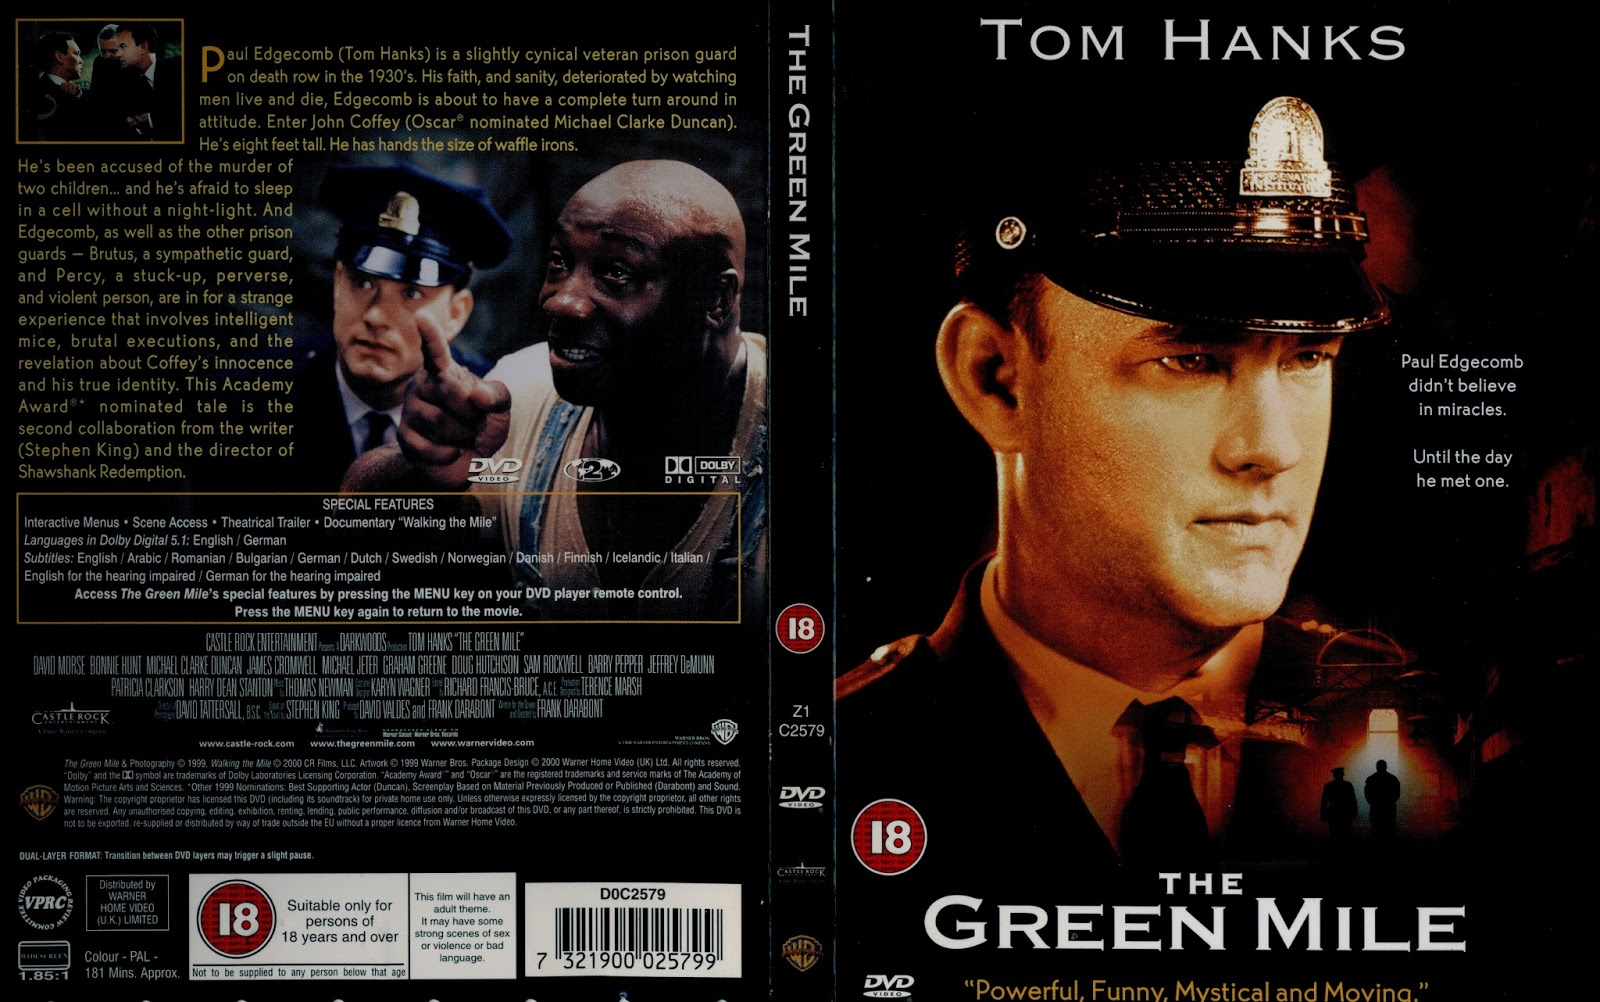 the green mile american drama film Cinema and television movies drama movies the green mile the green mile mcq the green mile mcq multiple-choice.